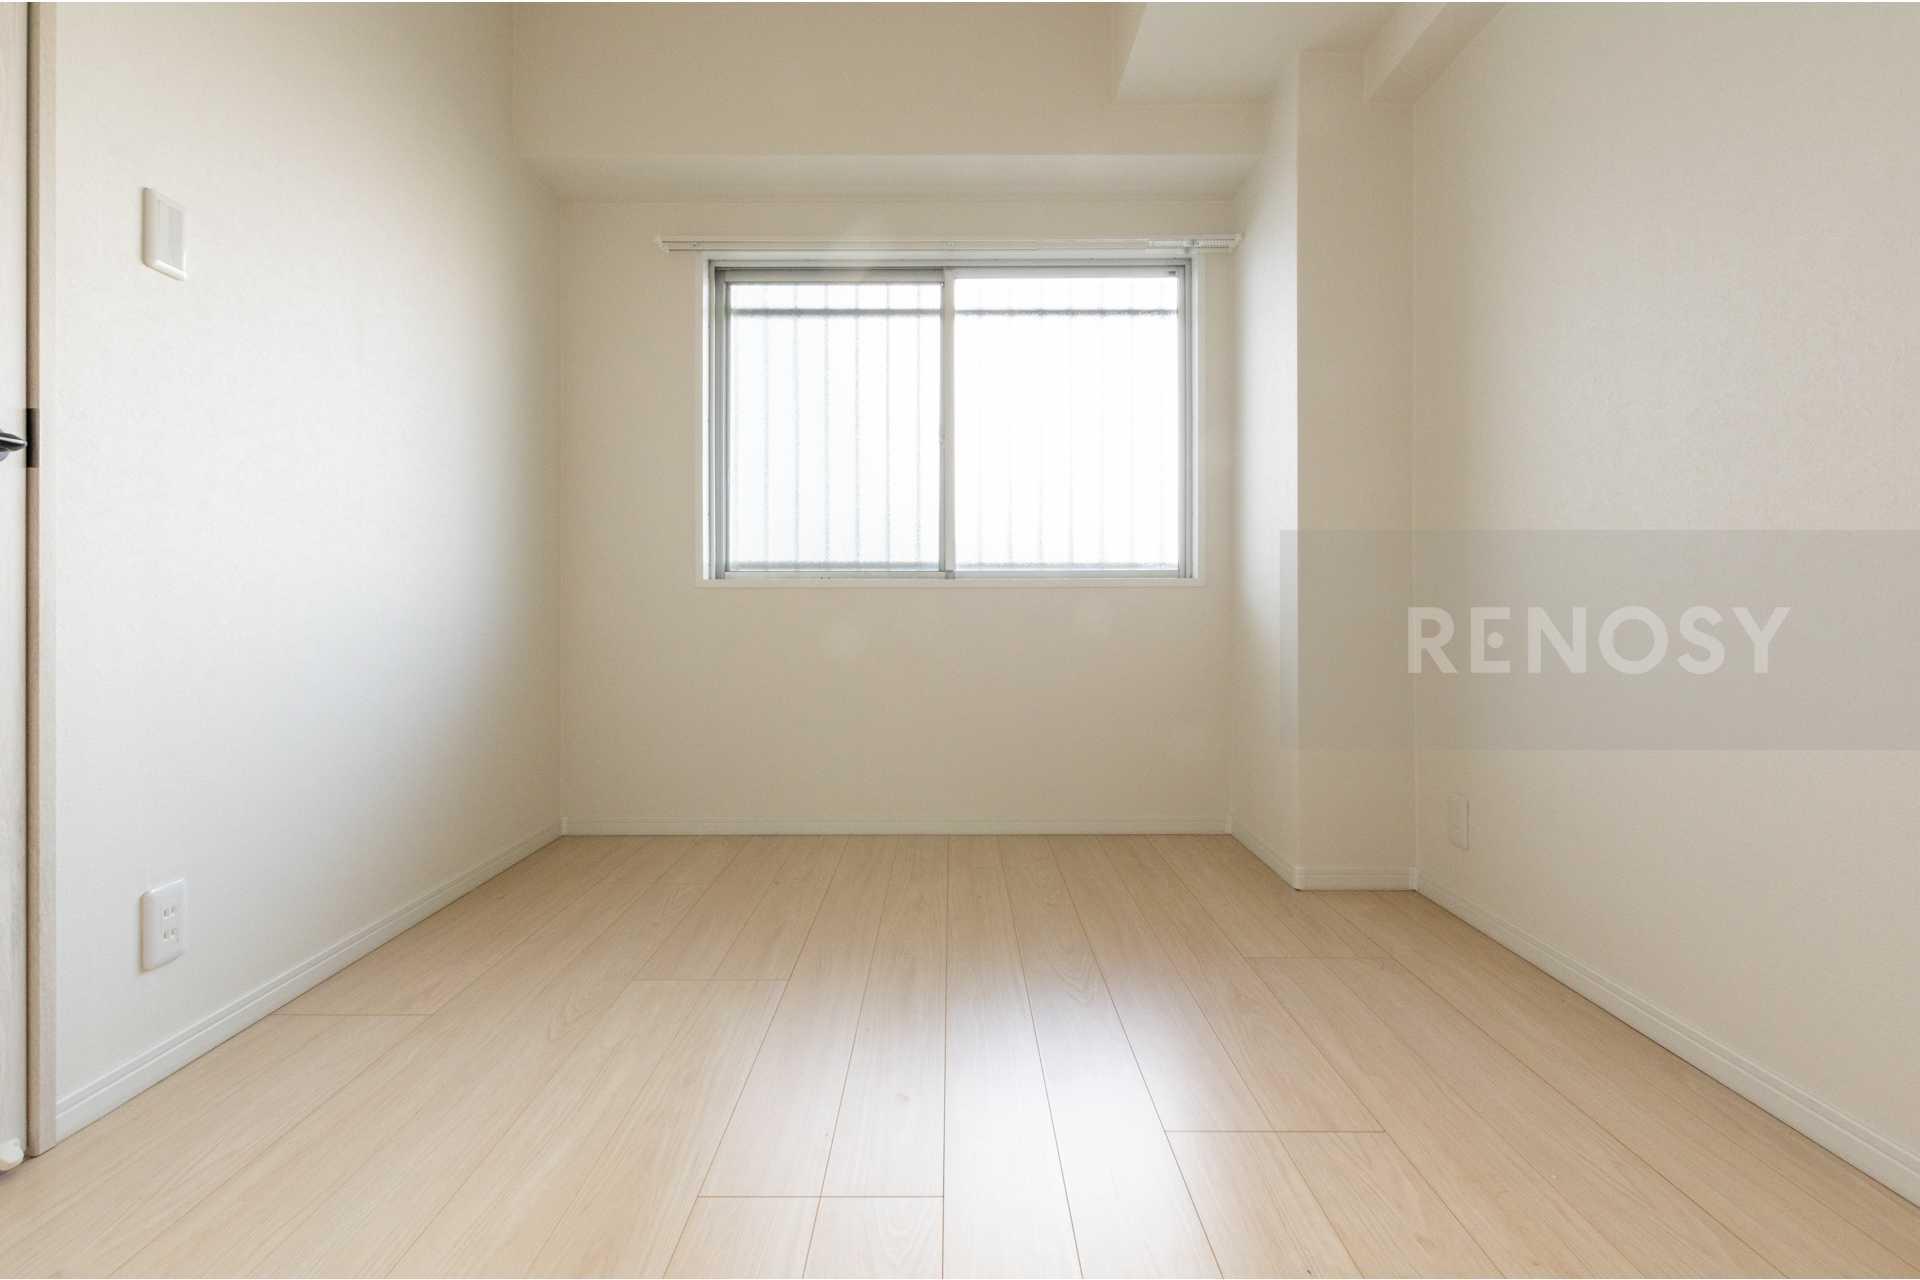 42_【ldd3_sell】五反田リーラハイタウン903号室_20201202195932.jpg